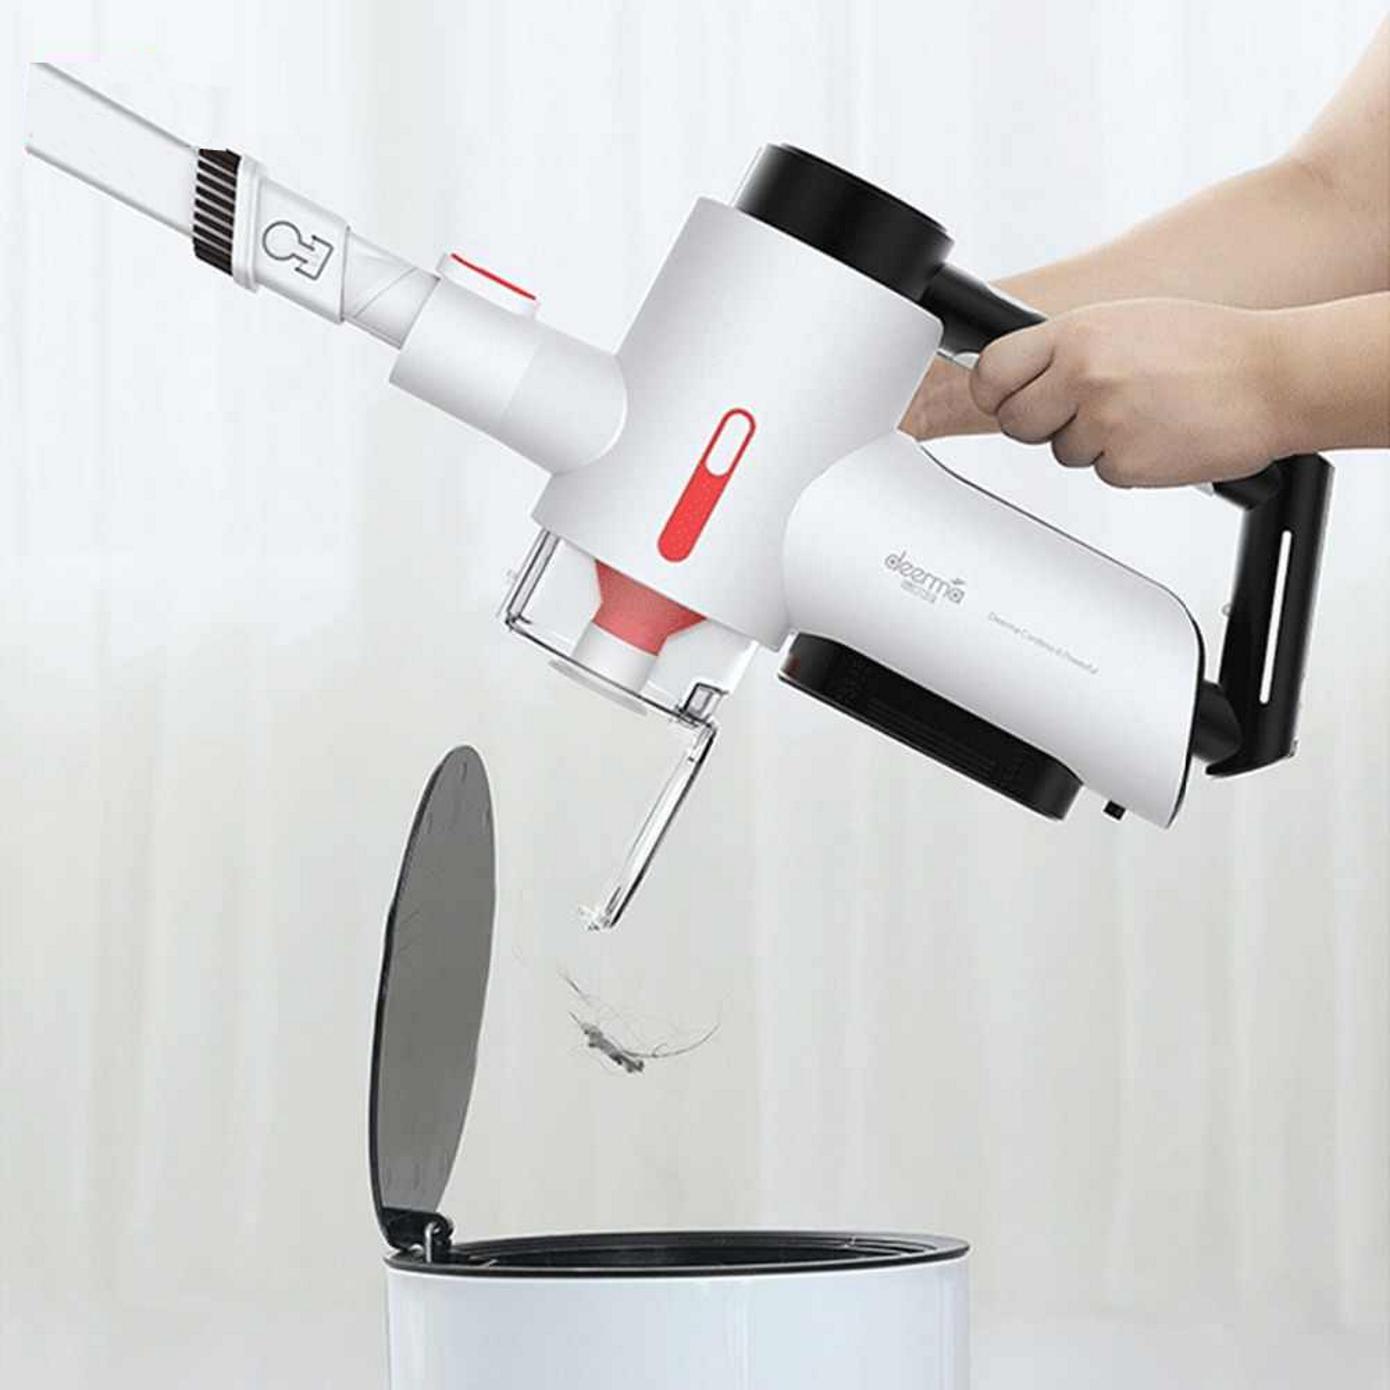 Opisanie Besprovodnoj Ruchnoj Pylesos Xiaomi Deerma Wireless Vacuum Cleaner Vc40 4